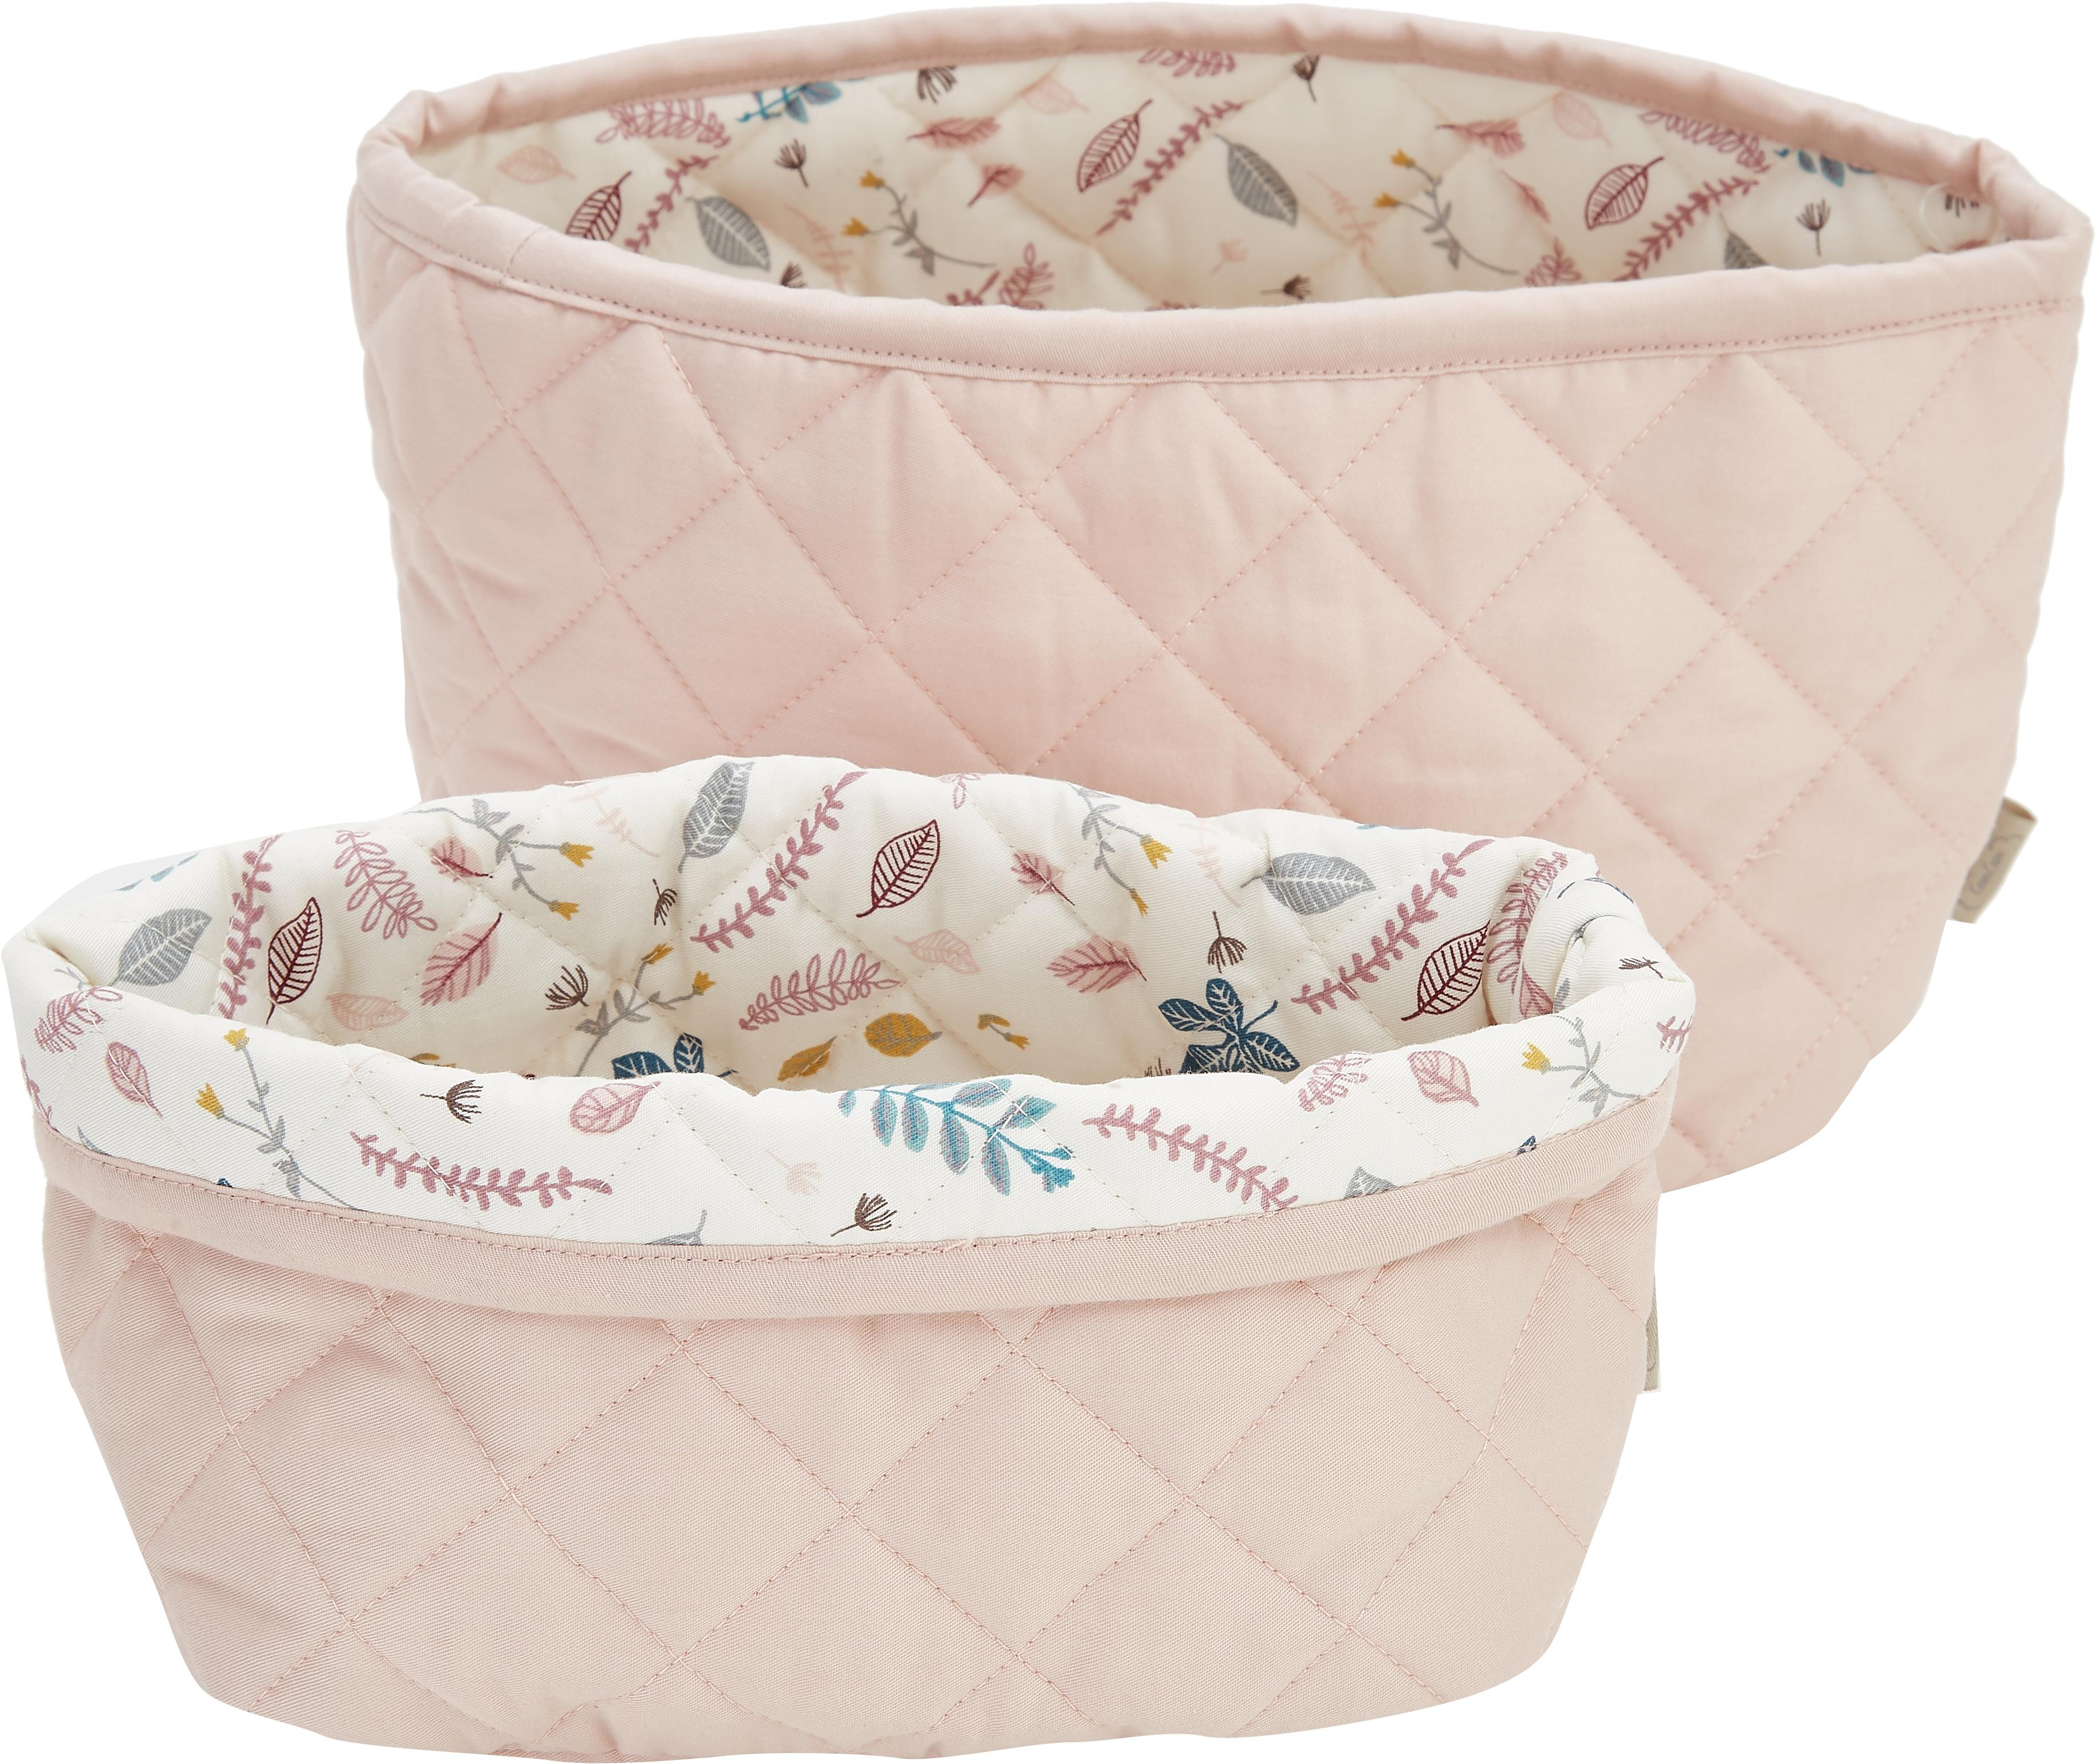 Set de cestas de algodón ecológico Pressed Leaves, 2pzas., Exterior: algodón orgánico, Crema, rosa, azul, gris, Tamaños diferentes